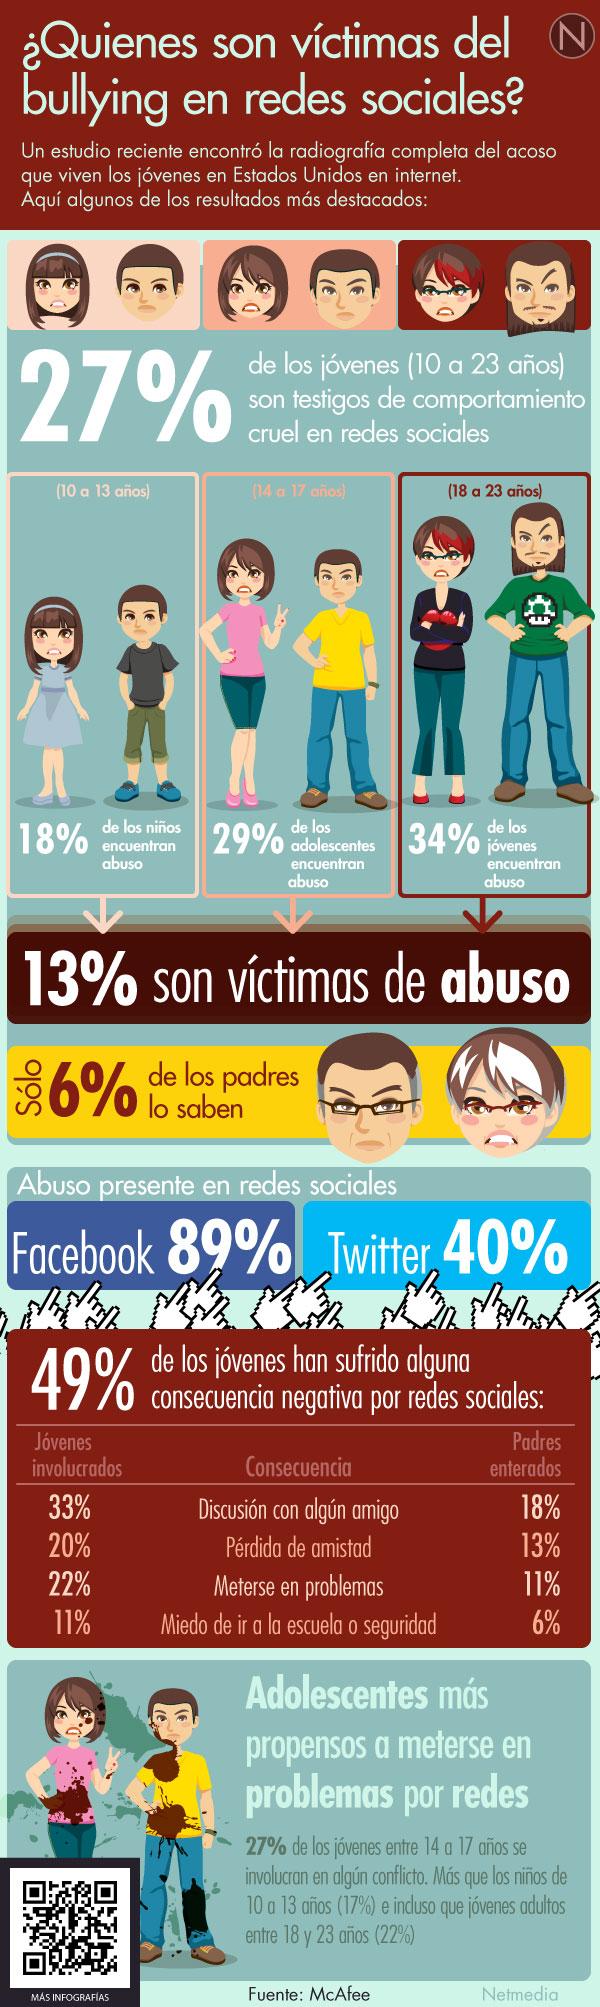 victimas-bullying-redes-sociales-infografia